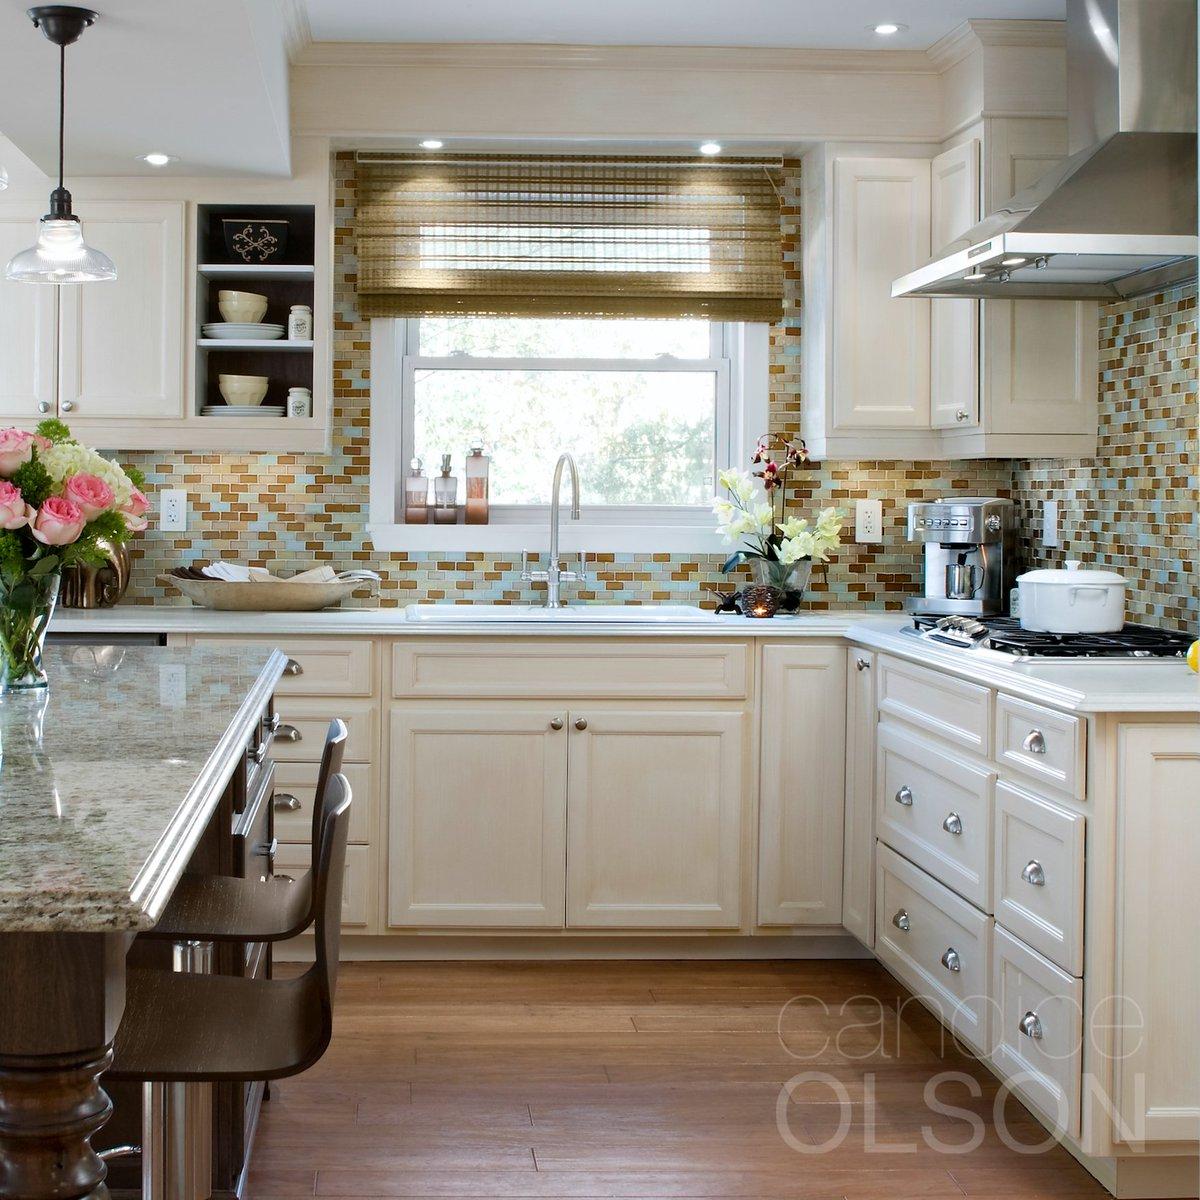 Candice Olson Kitchen Design Candice Olson Candiceolson Twitter